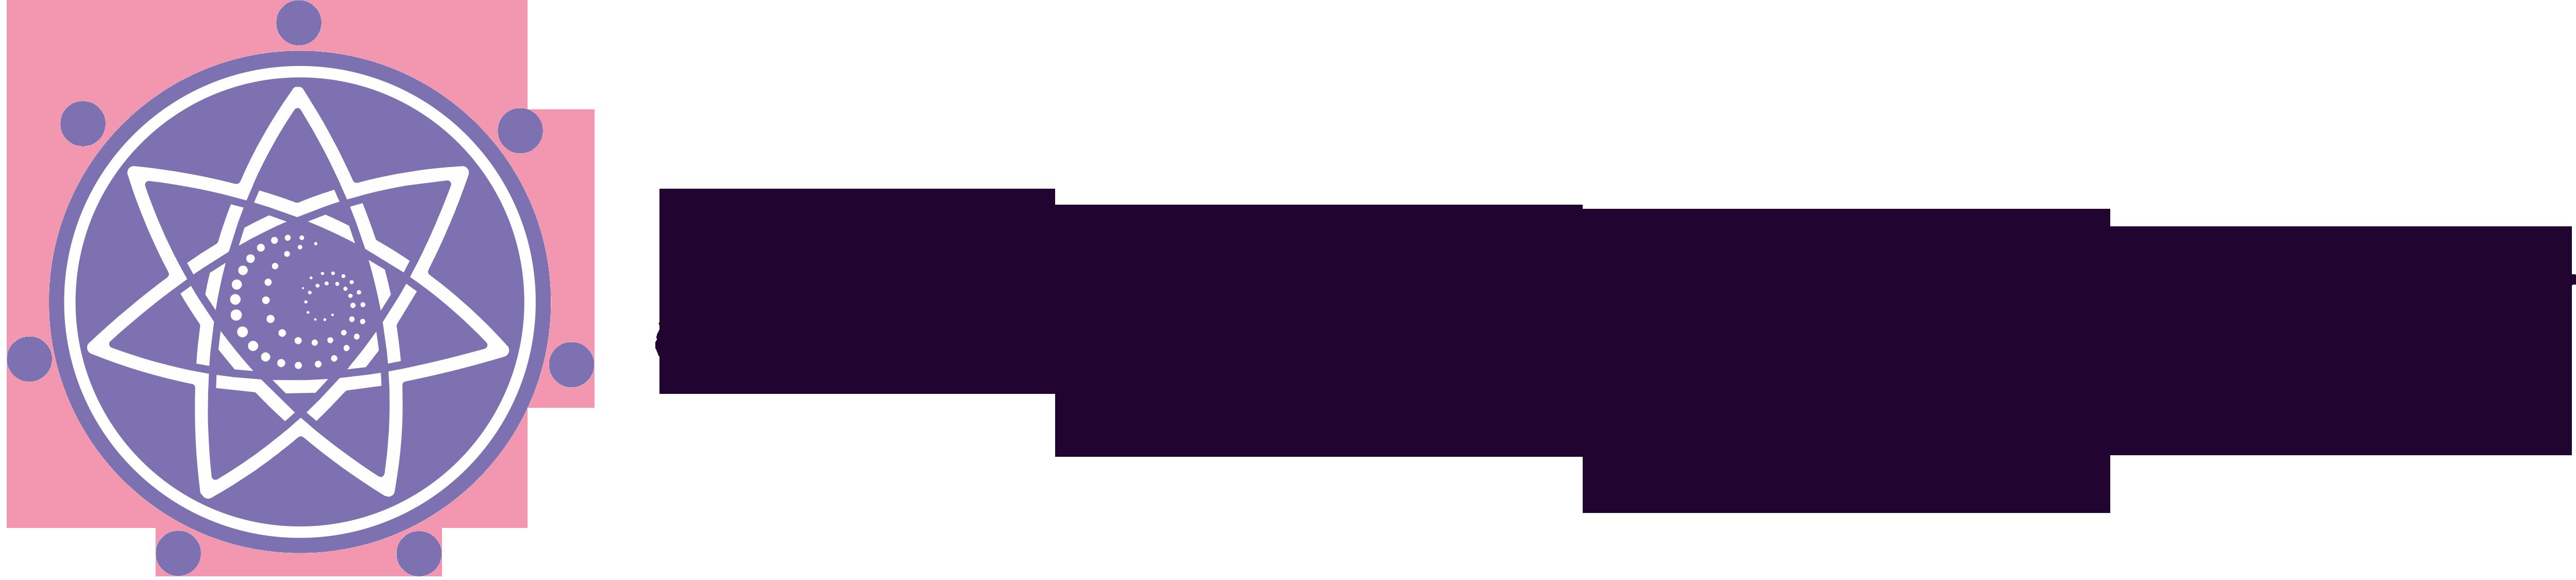 Chandra Központ